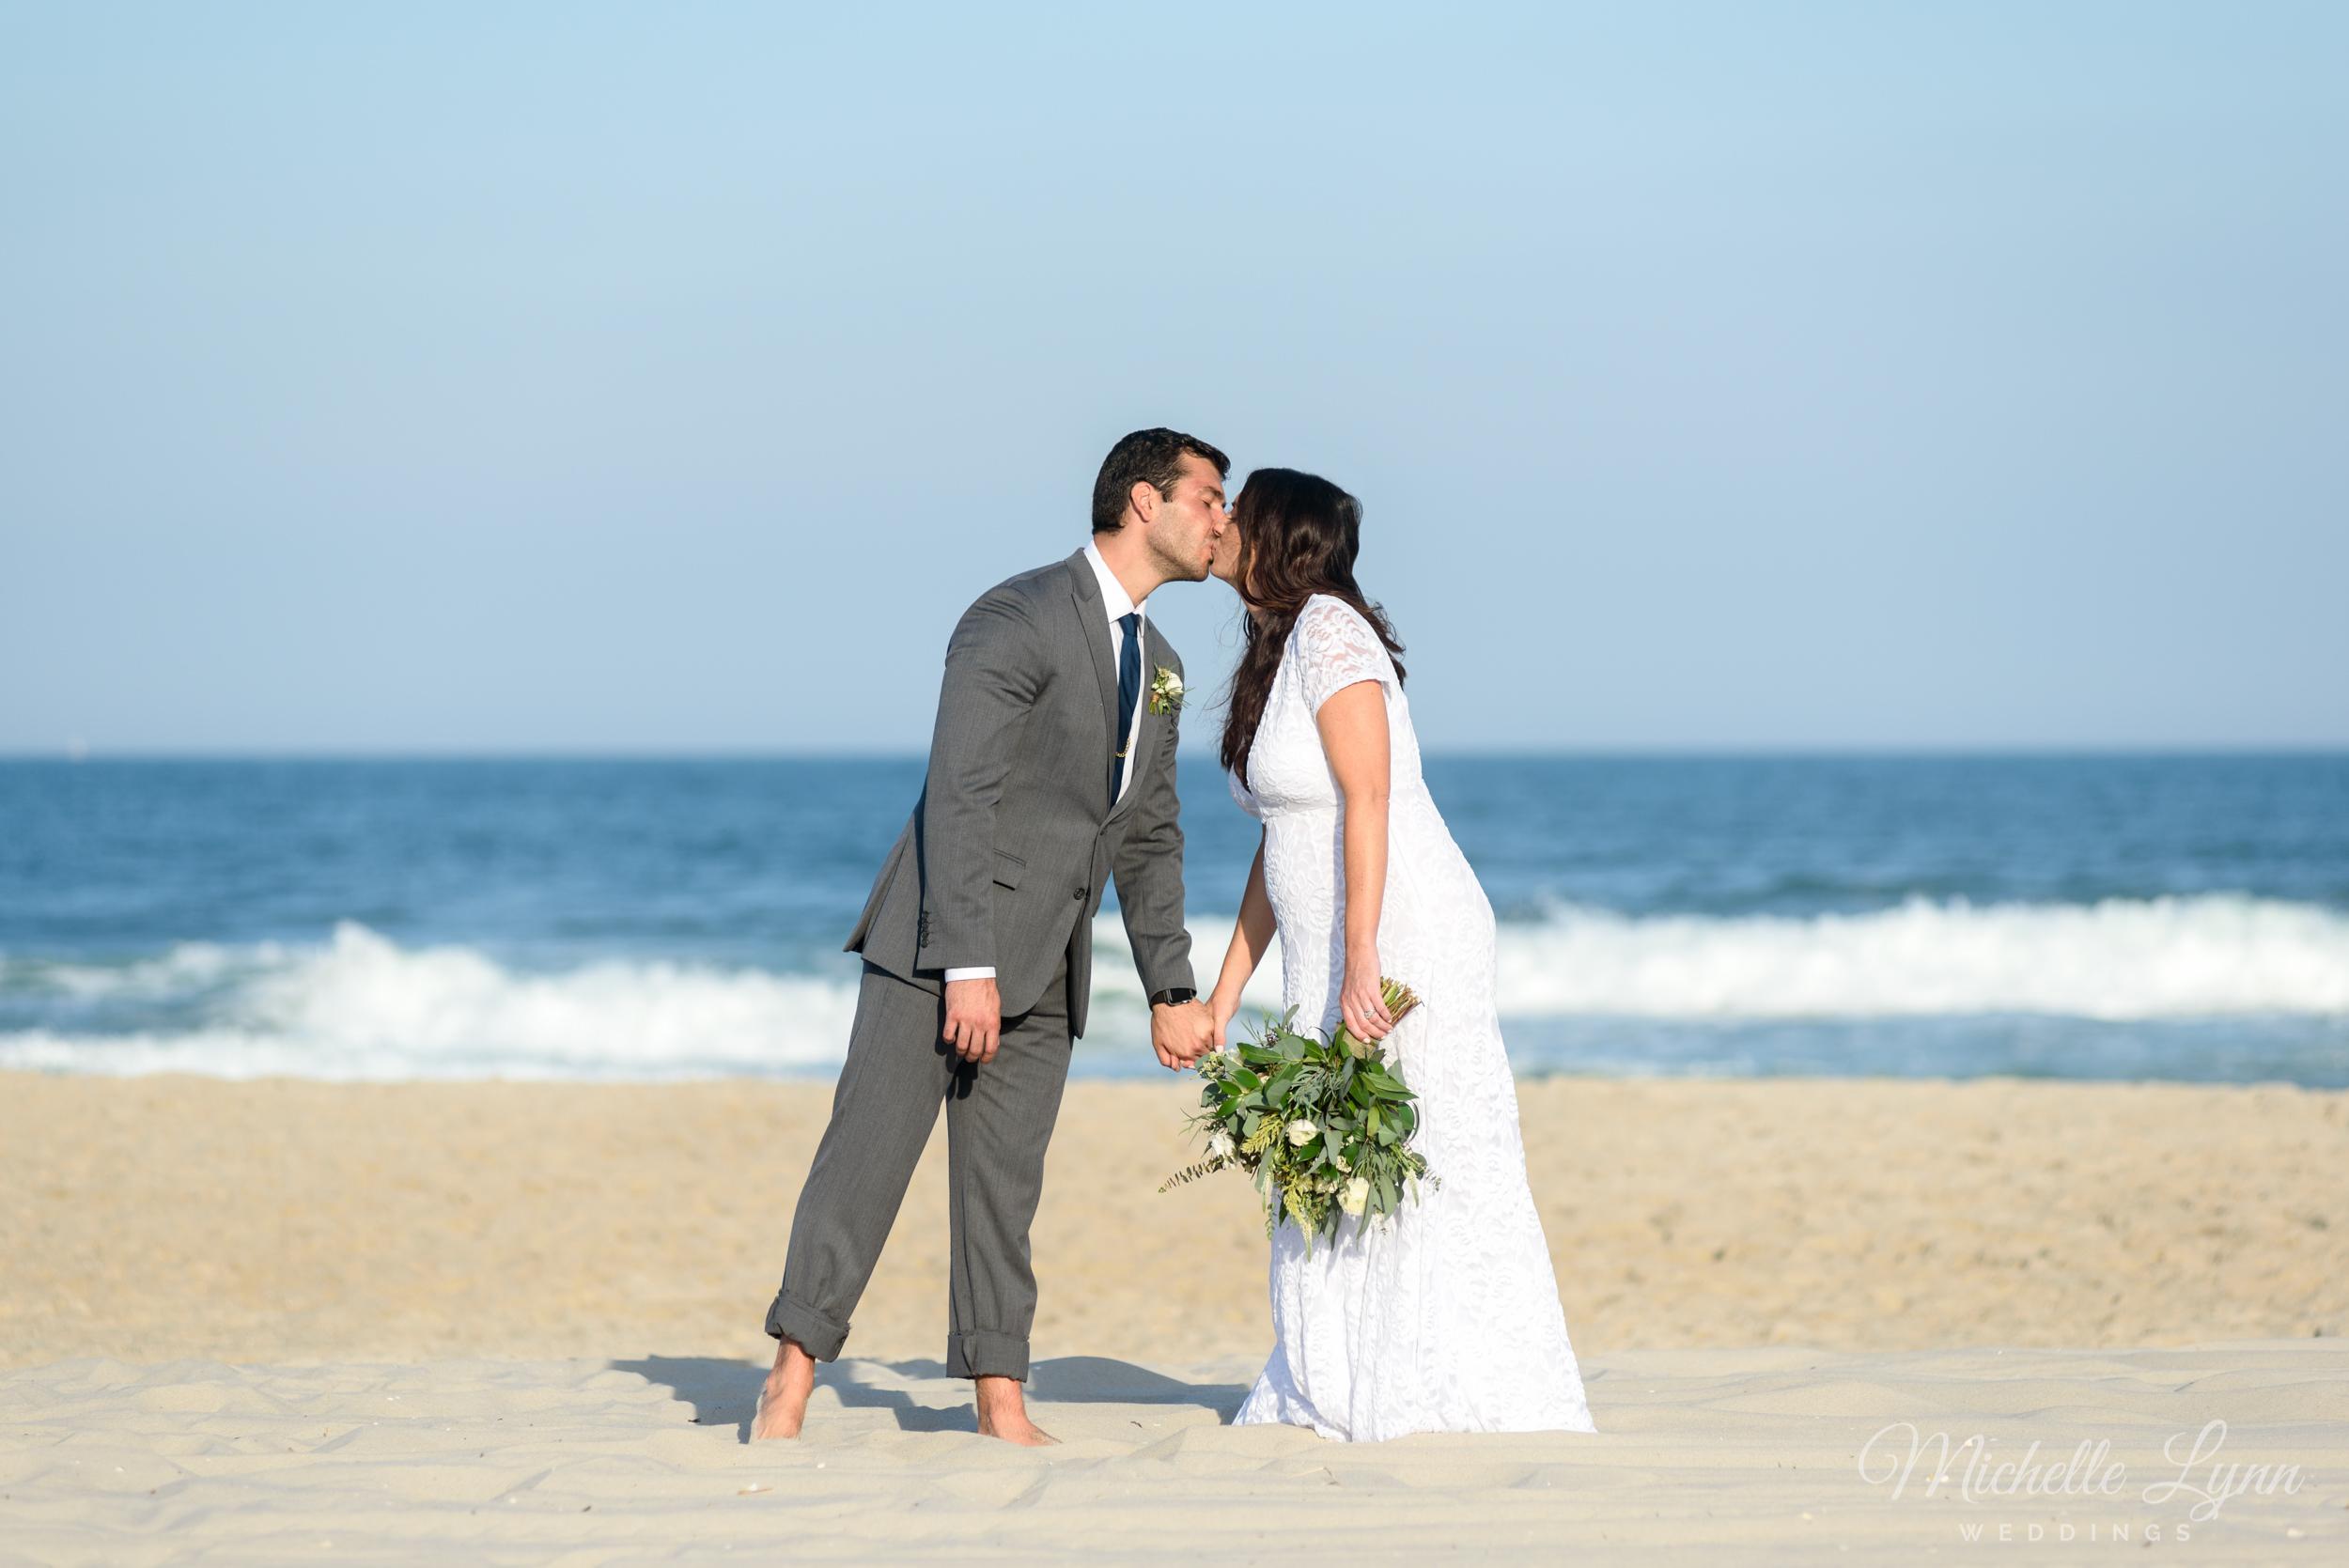 mlw-long-beach-island-new-jersey-wedding-photography-19.jpg